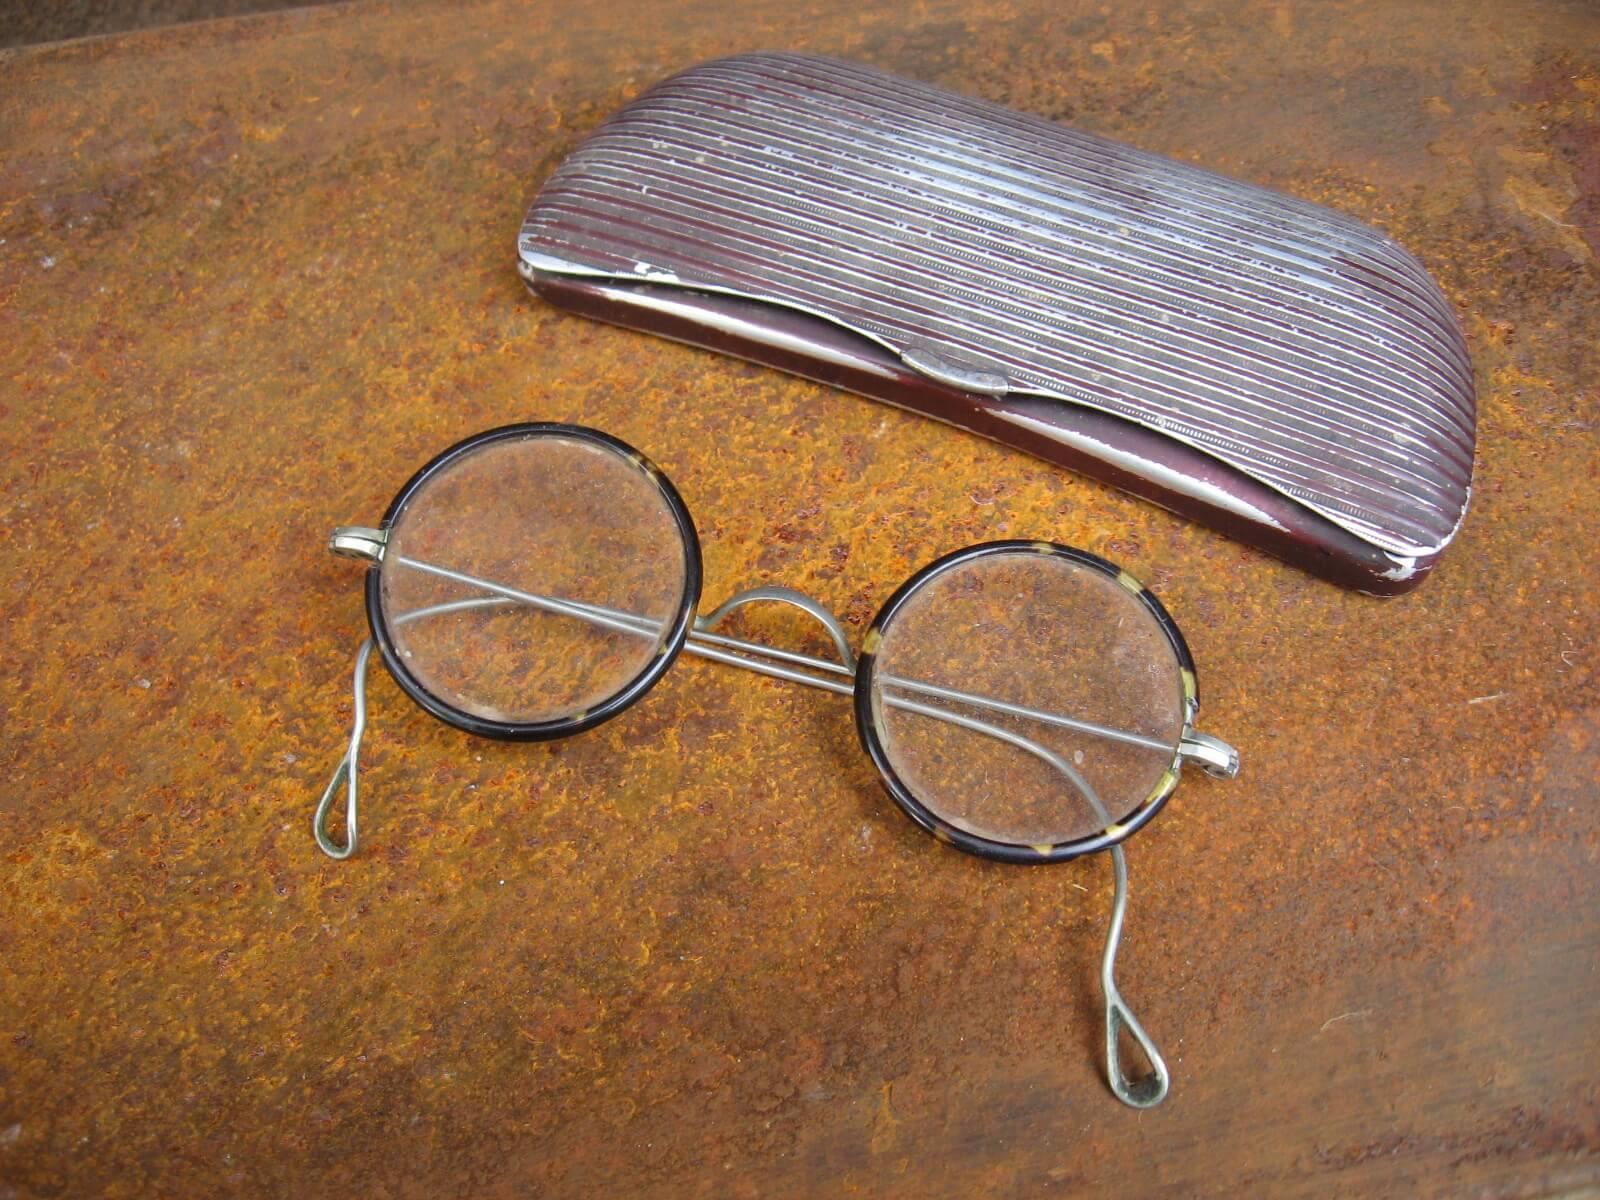 1920s round tortoiseshell harry potter glasses with metal case_C_PumpjackPiddlewick